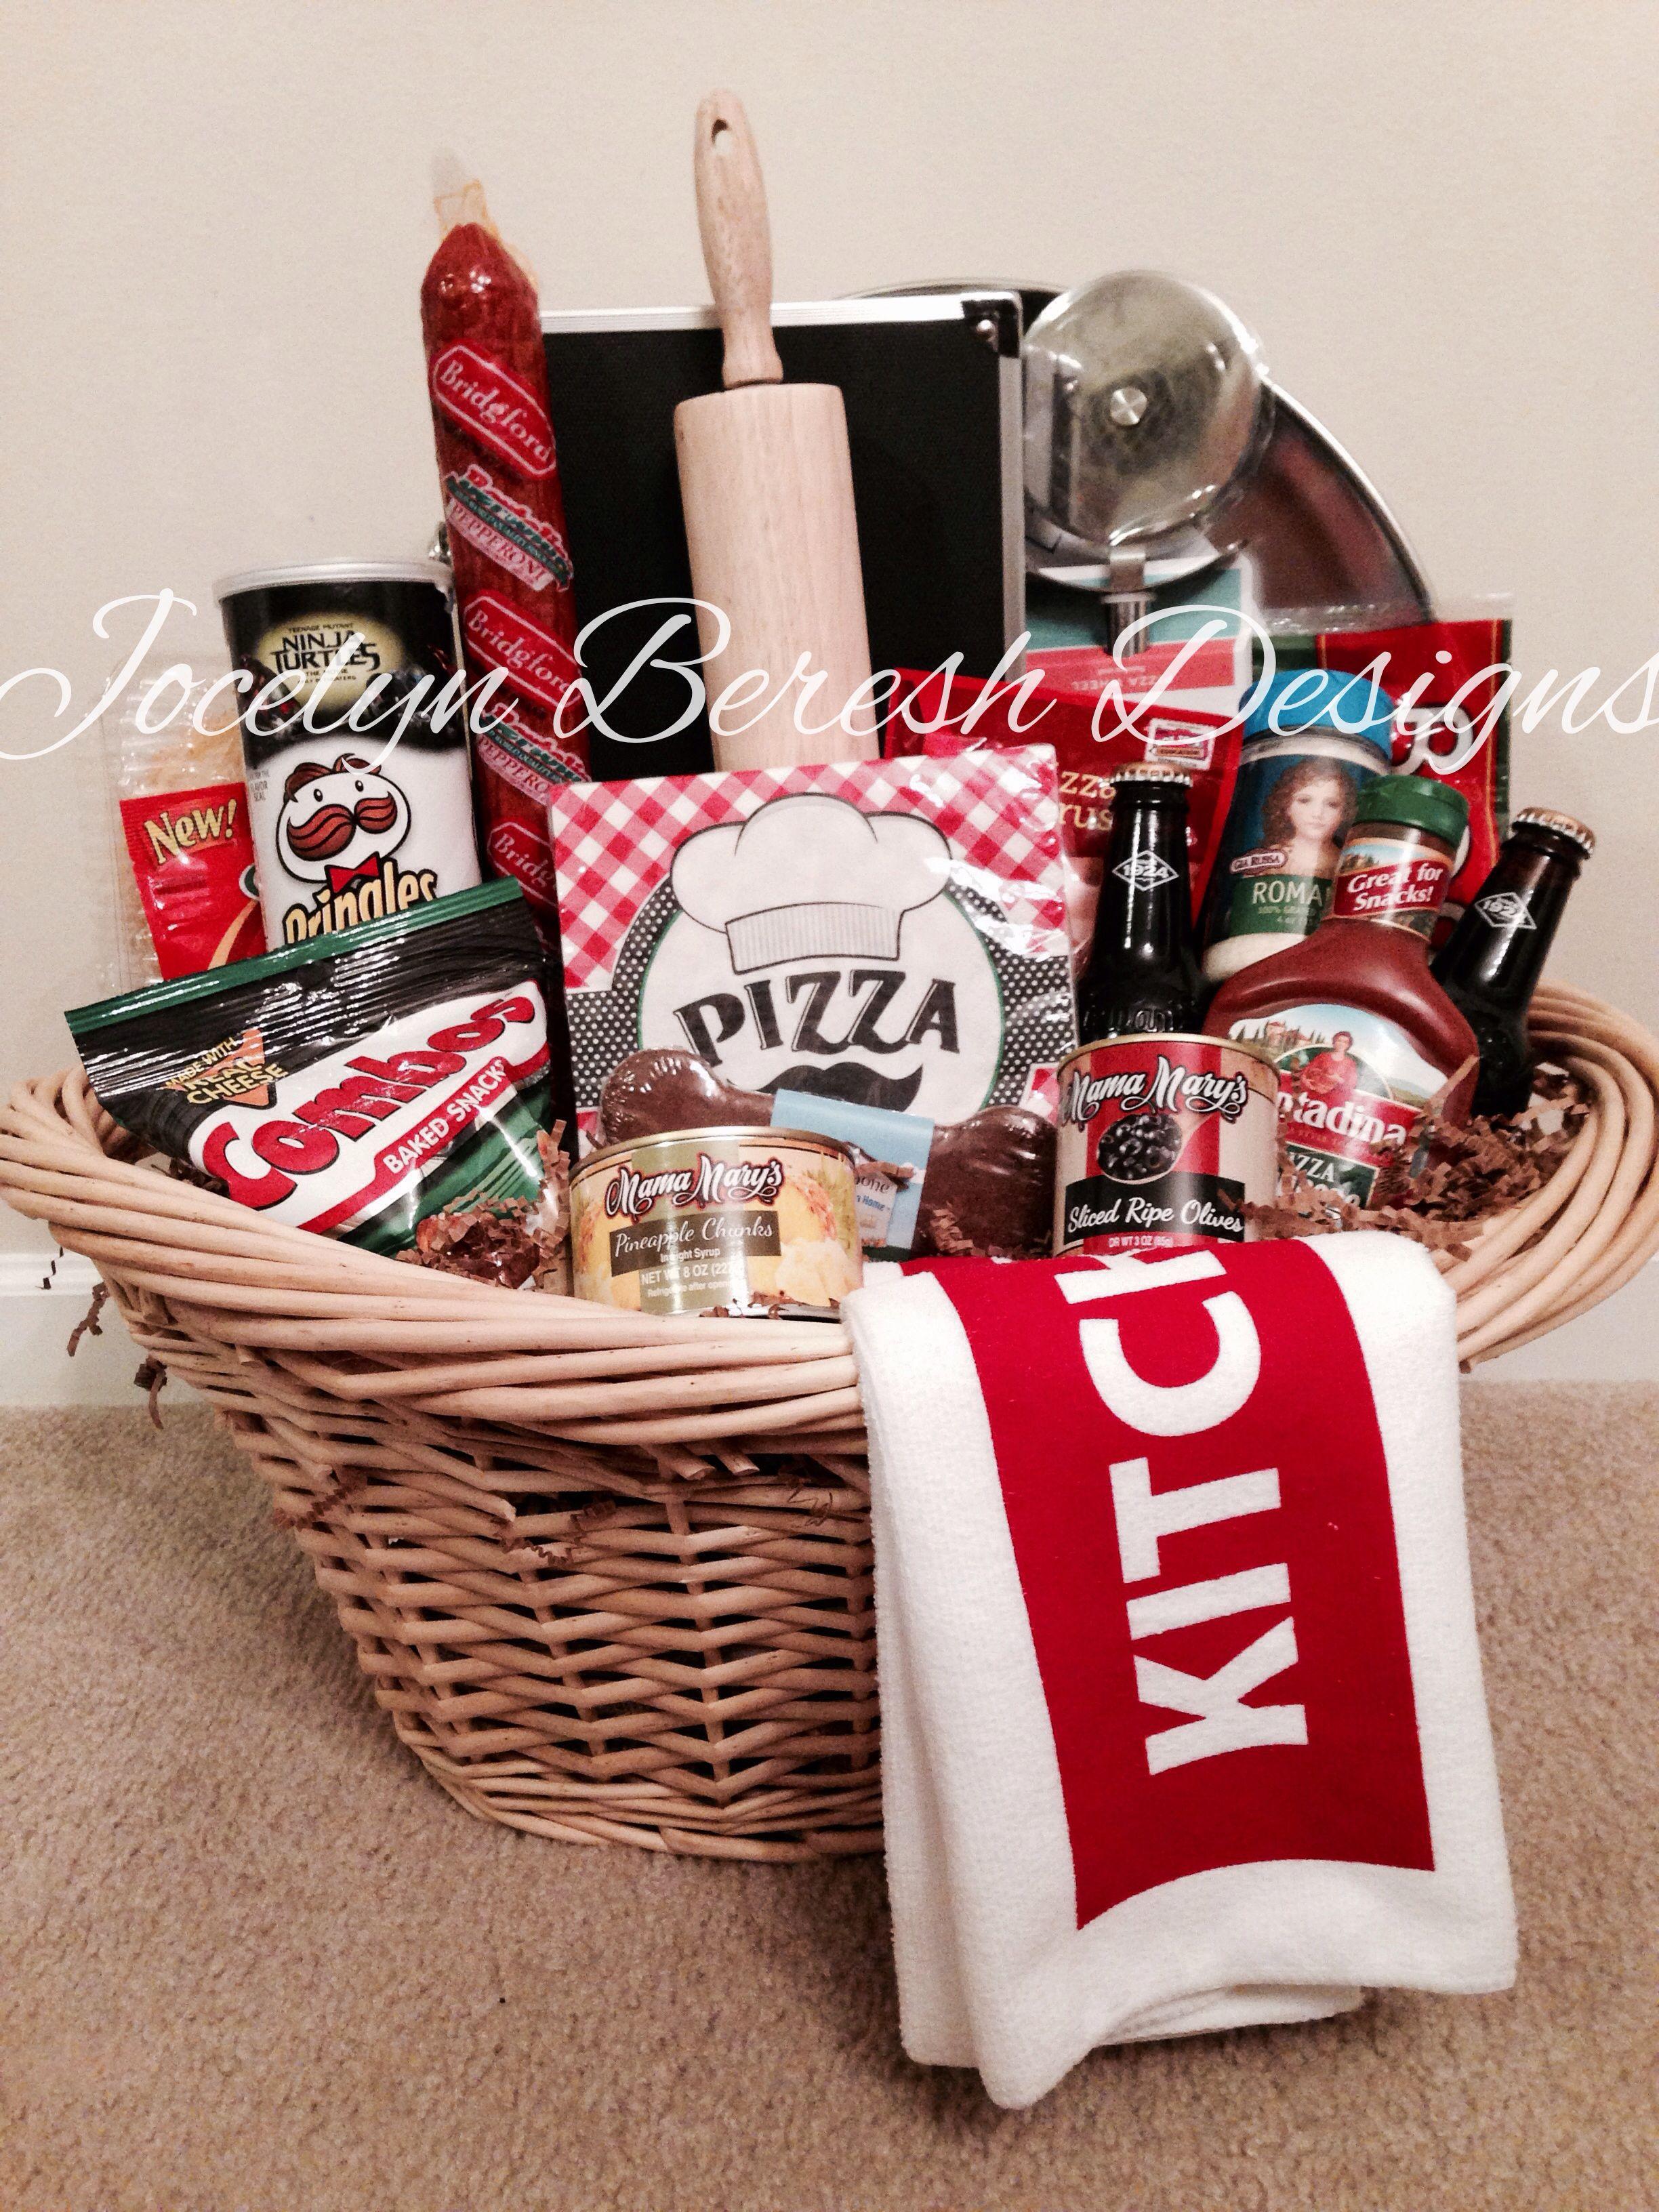 Pizza Night Basket By Jocelynbereshdesigns Luxury Gift Baskets Customs Gift Baskets Fundraising Baskets Pittsburgh Gifts Family Gifts Family Gift Baskets